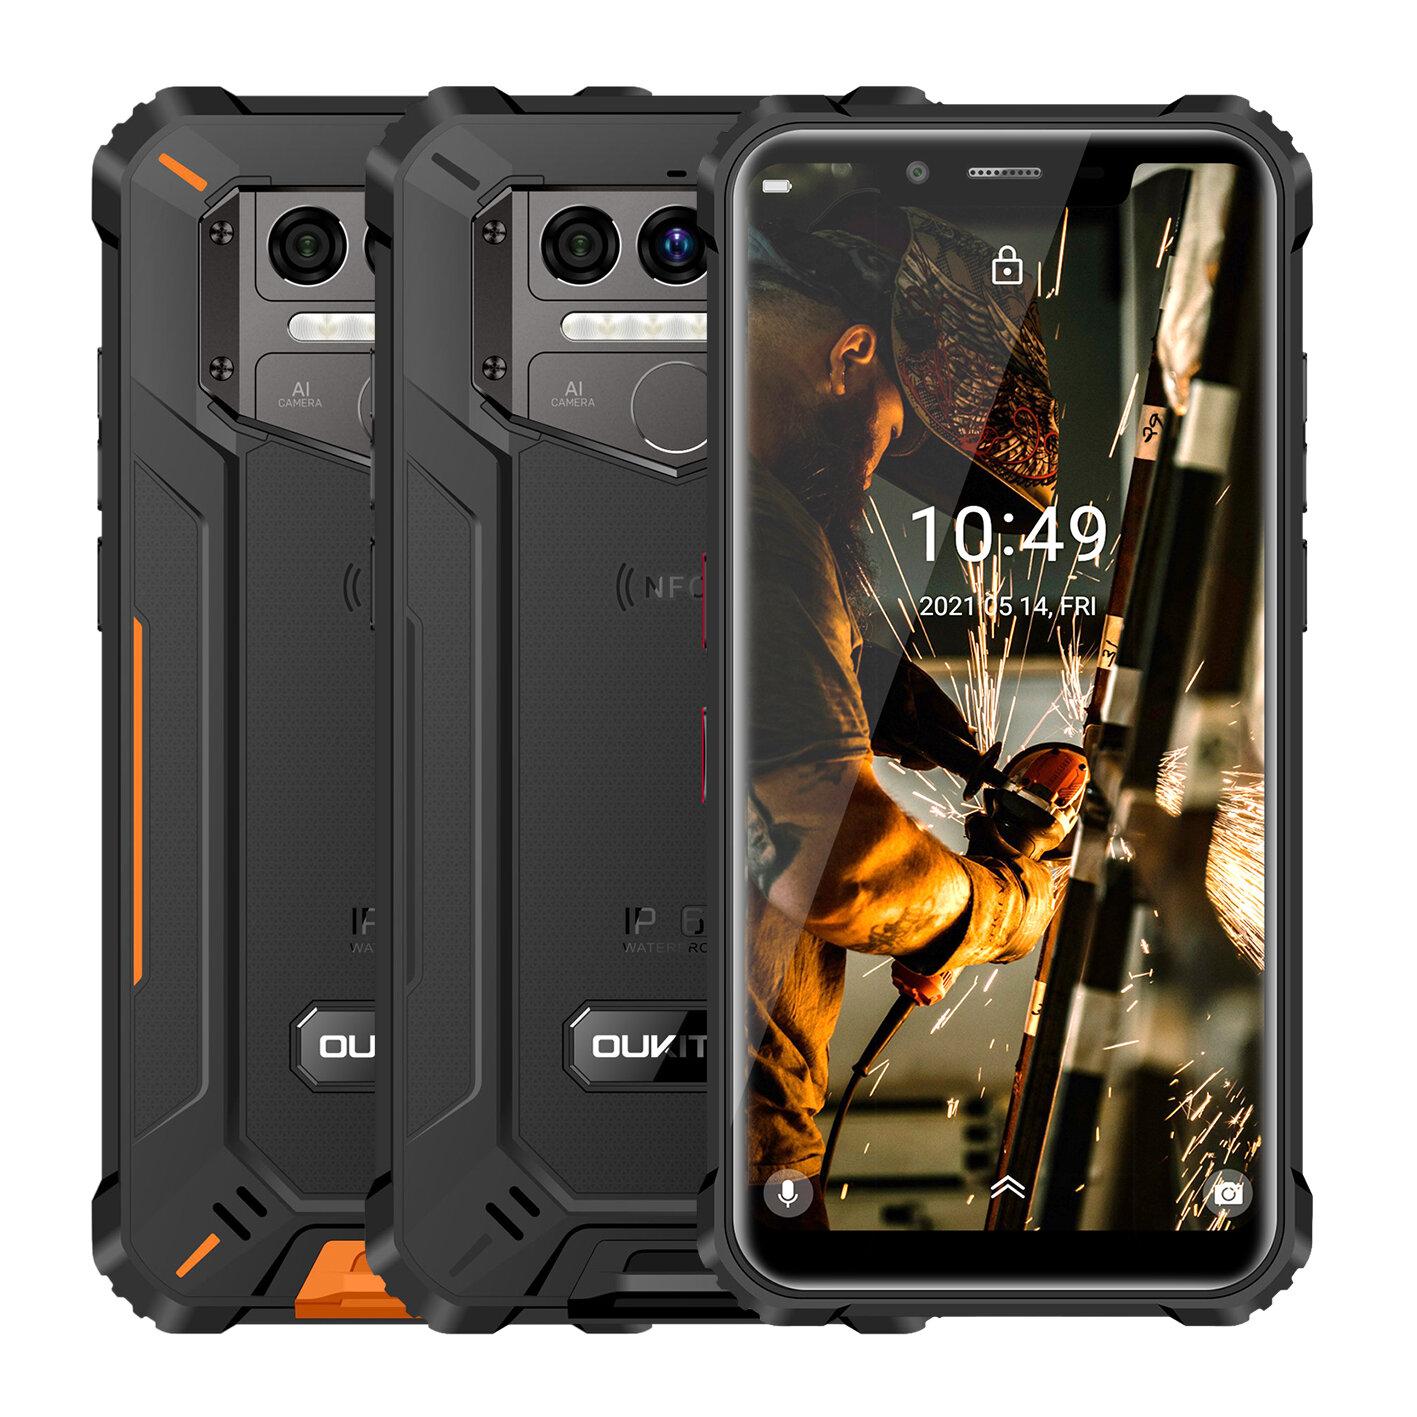 OUKITEL WP9 Global Bands IP68&IP69K Waterproof 6GB 128GB NFC 8000mAh 5.86 inch 16MP Triple Rear Camera Helio P60 4G Smartphone